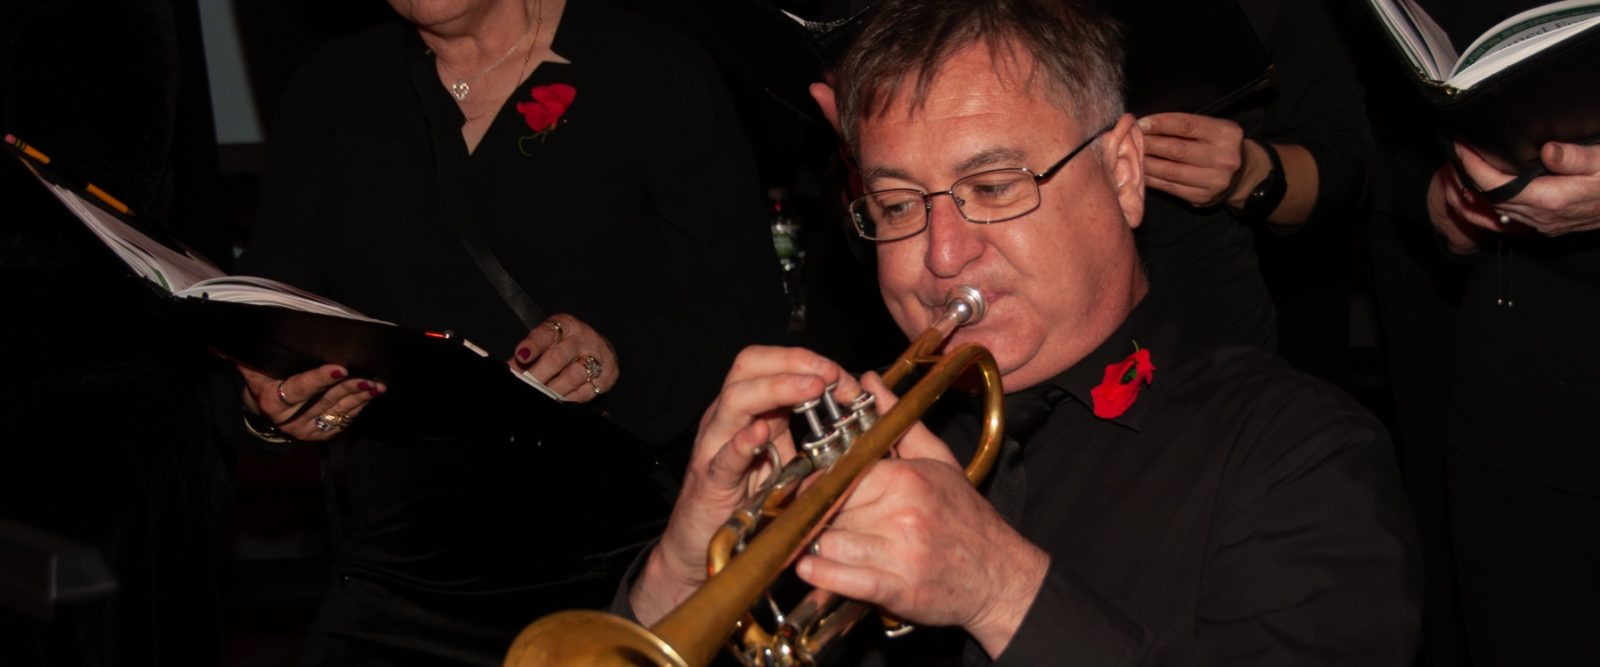 Jeff Hoefler, trumpet